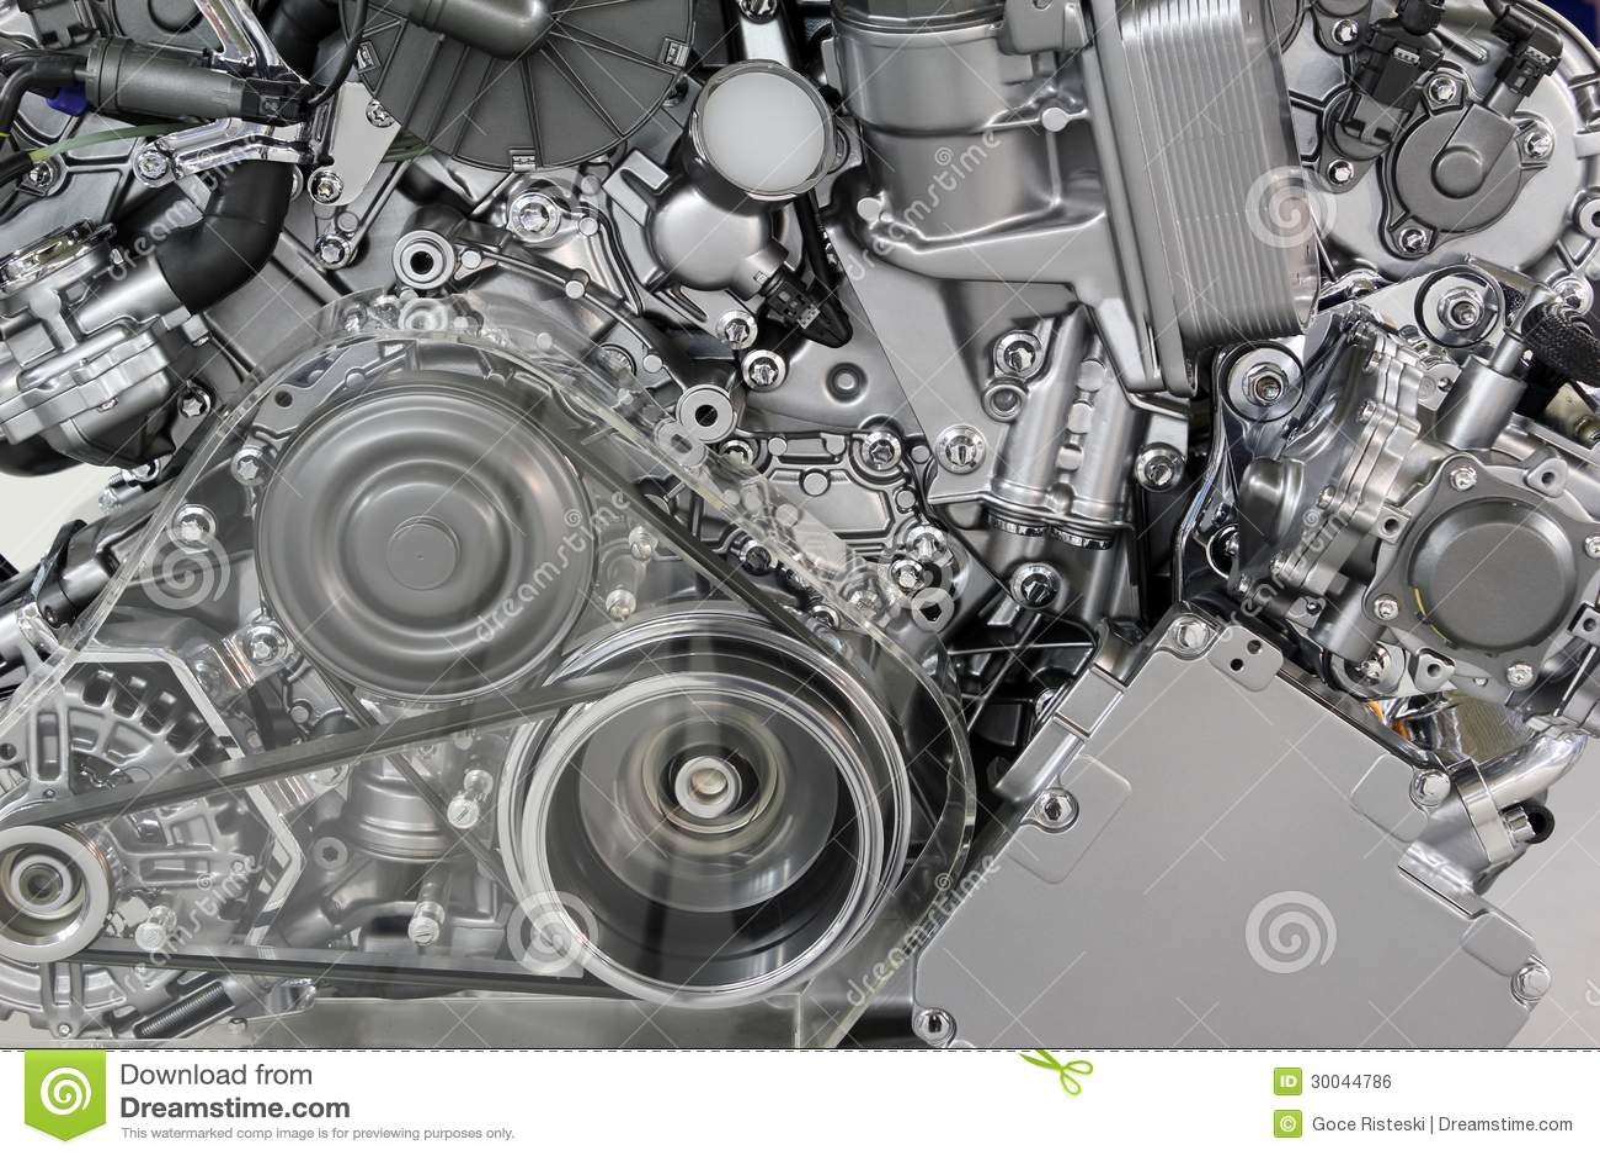 Engine Diagram 2001 Hyundai Santa Fe And Belts Engine